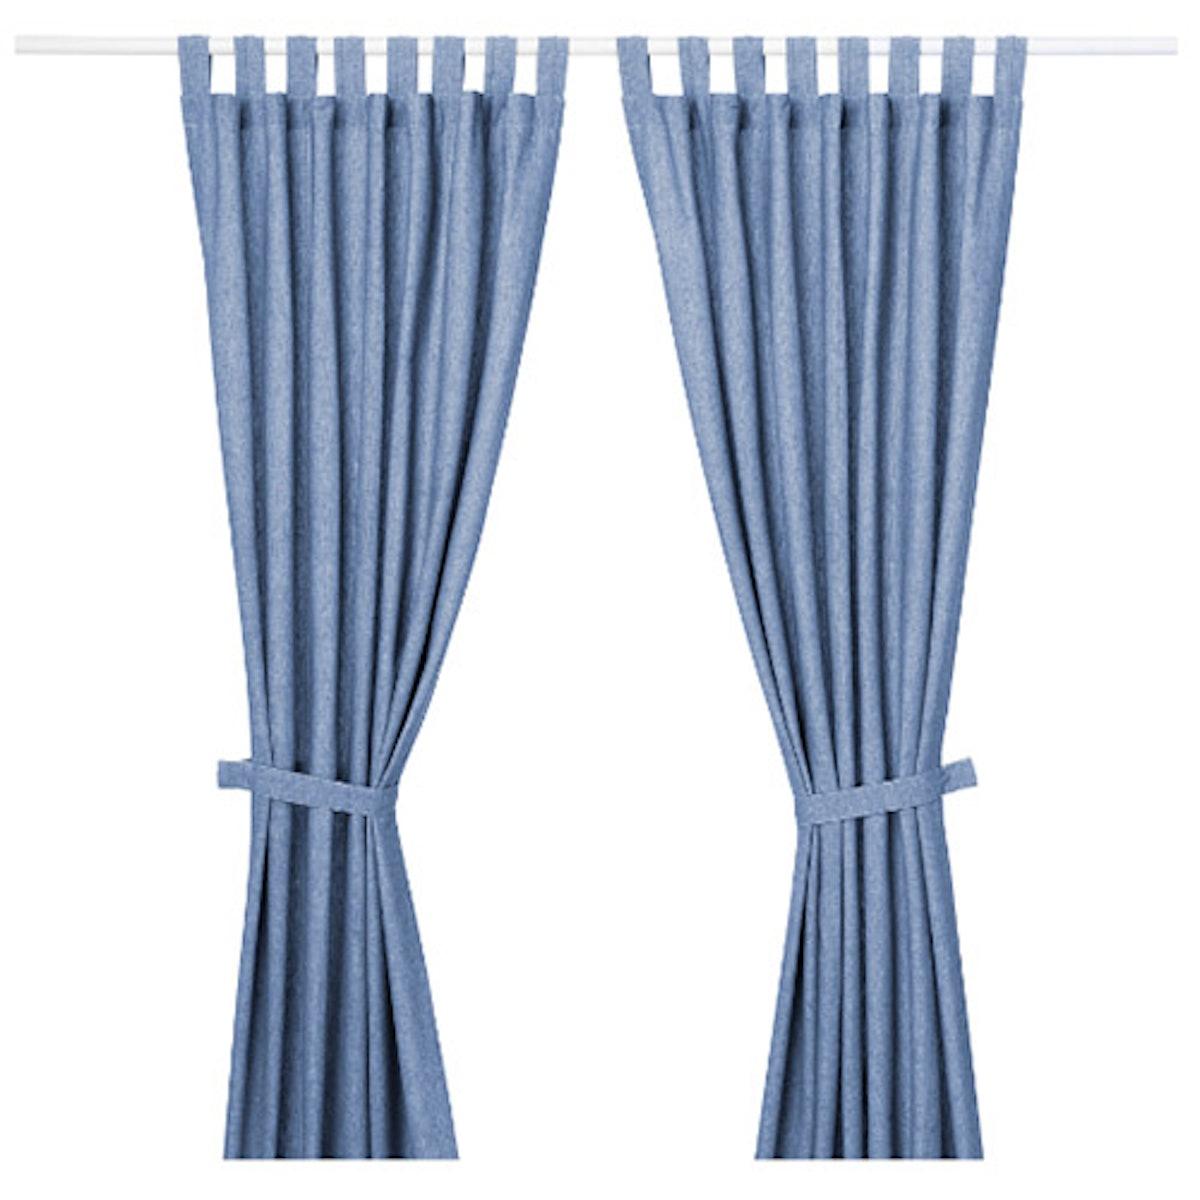 LENDA Curtains